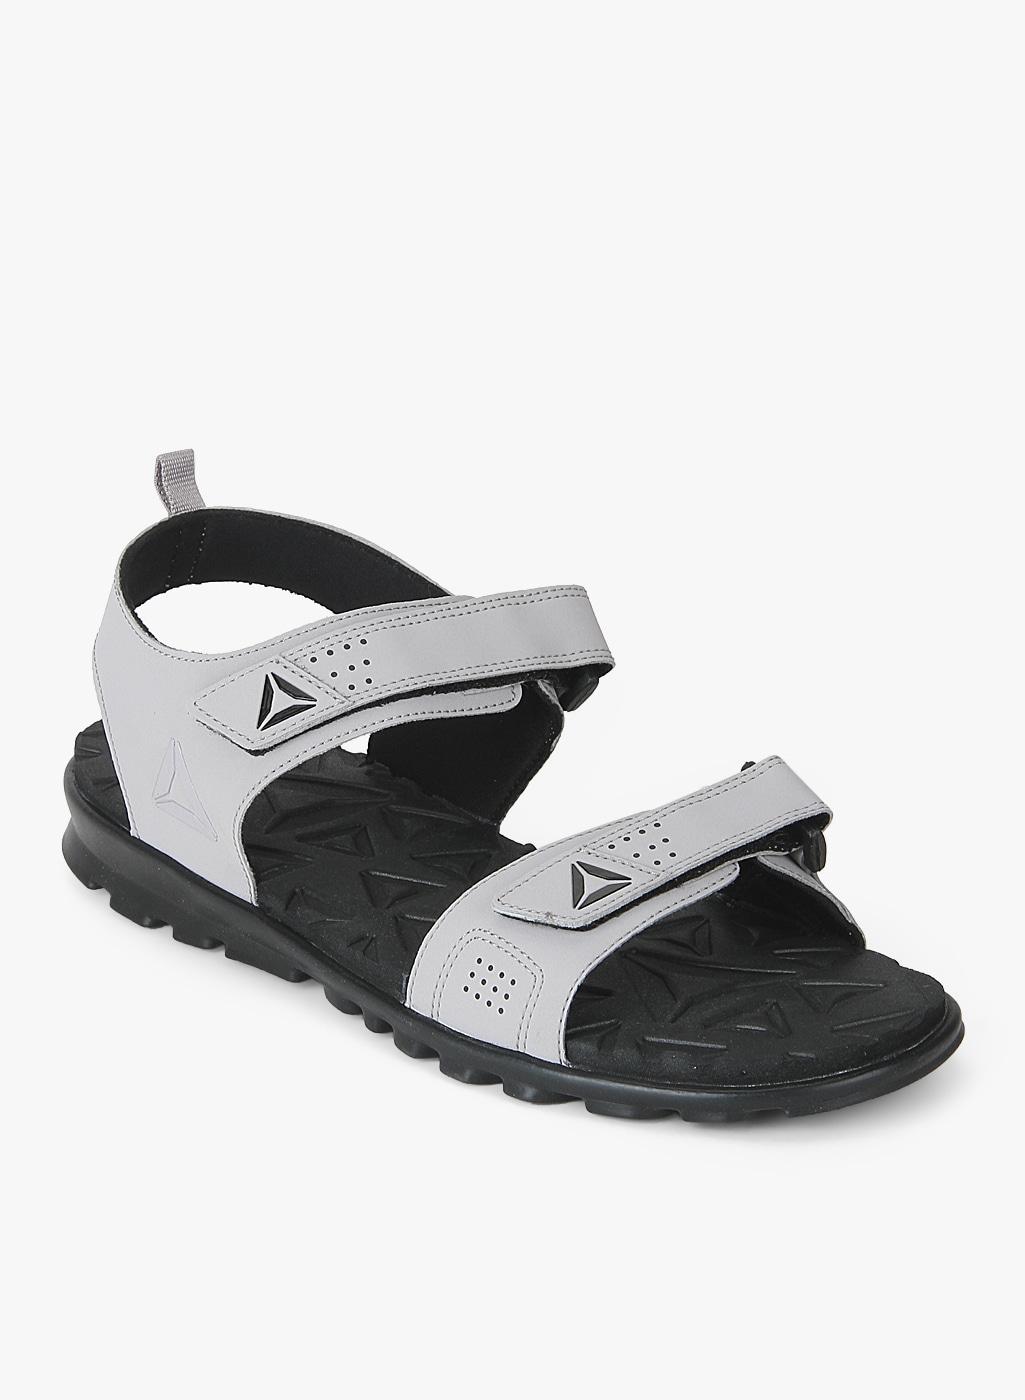 b330b44c4 Reebok Swimwear Sports Sandals - Buy Reebok Swimwear Sports Sandals online  in India